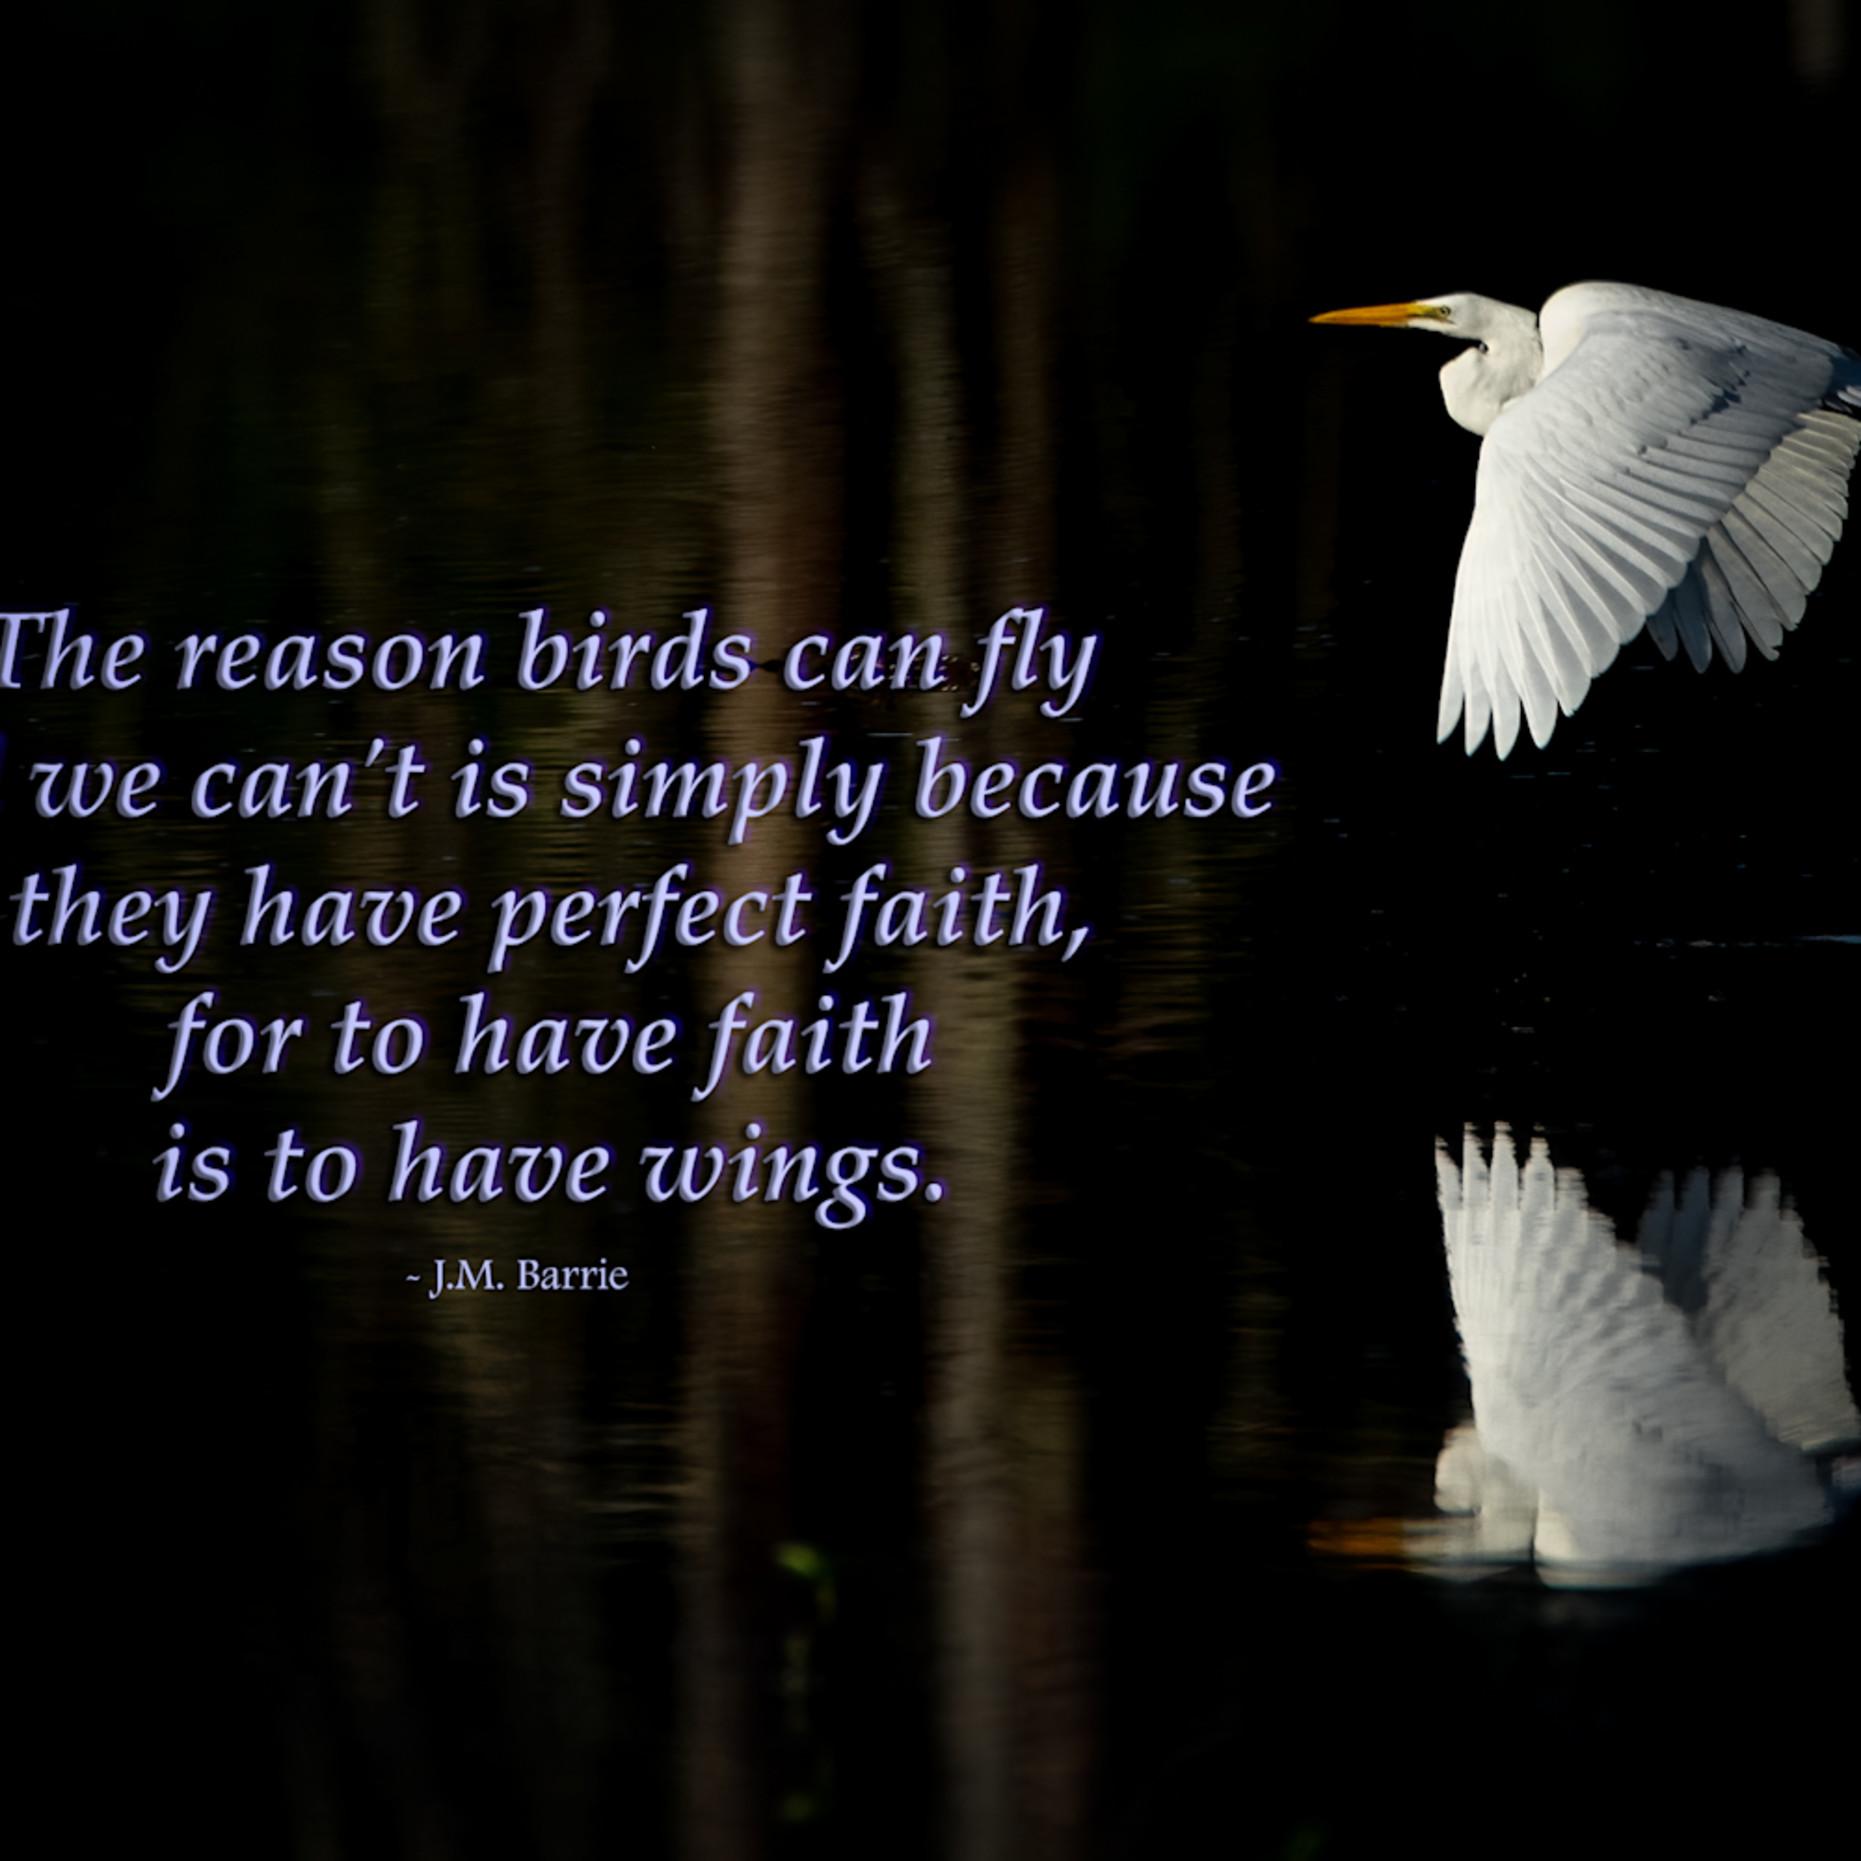 The reason birds can fly osylhx